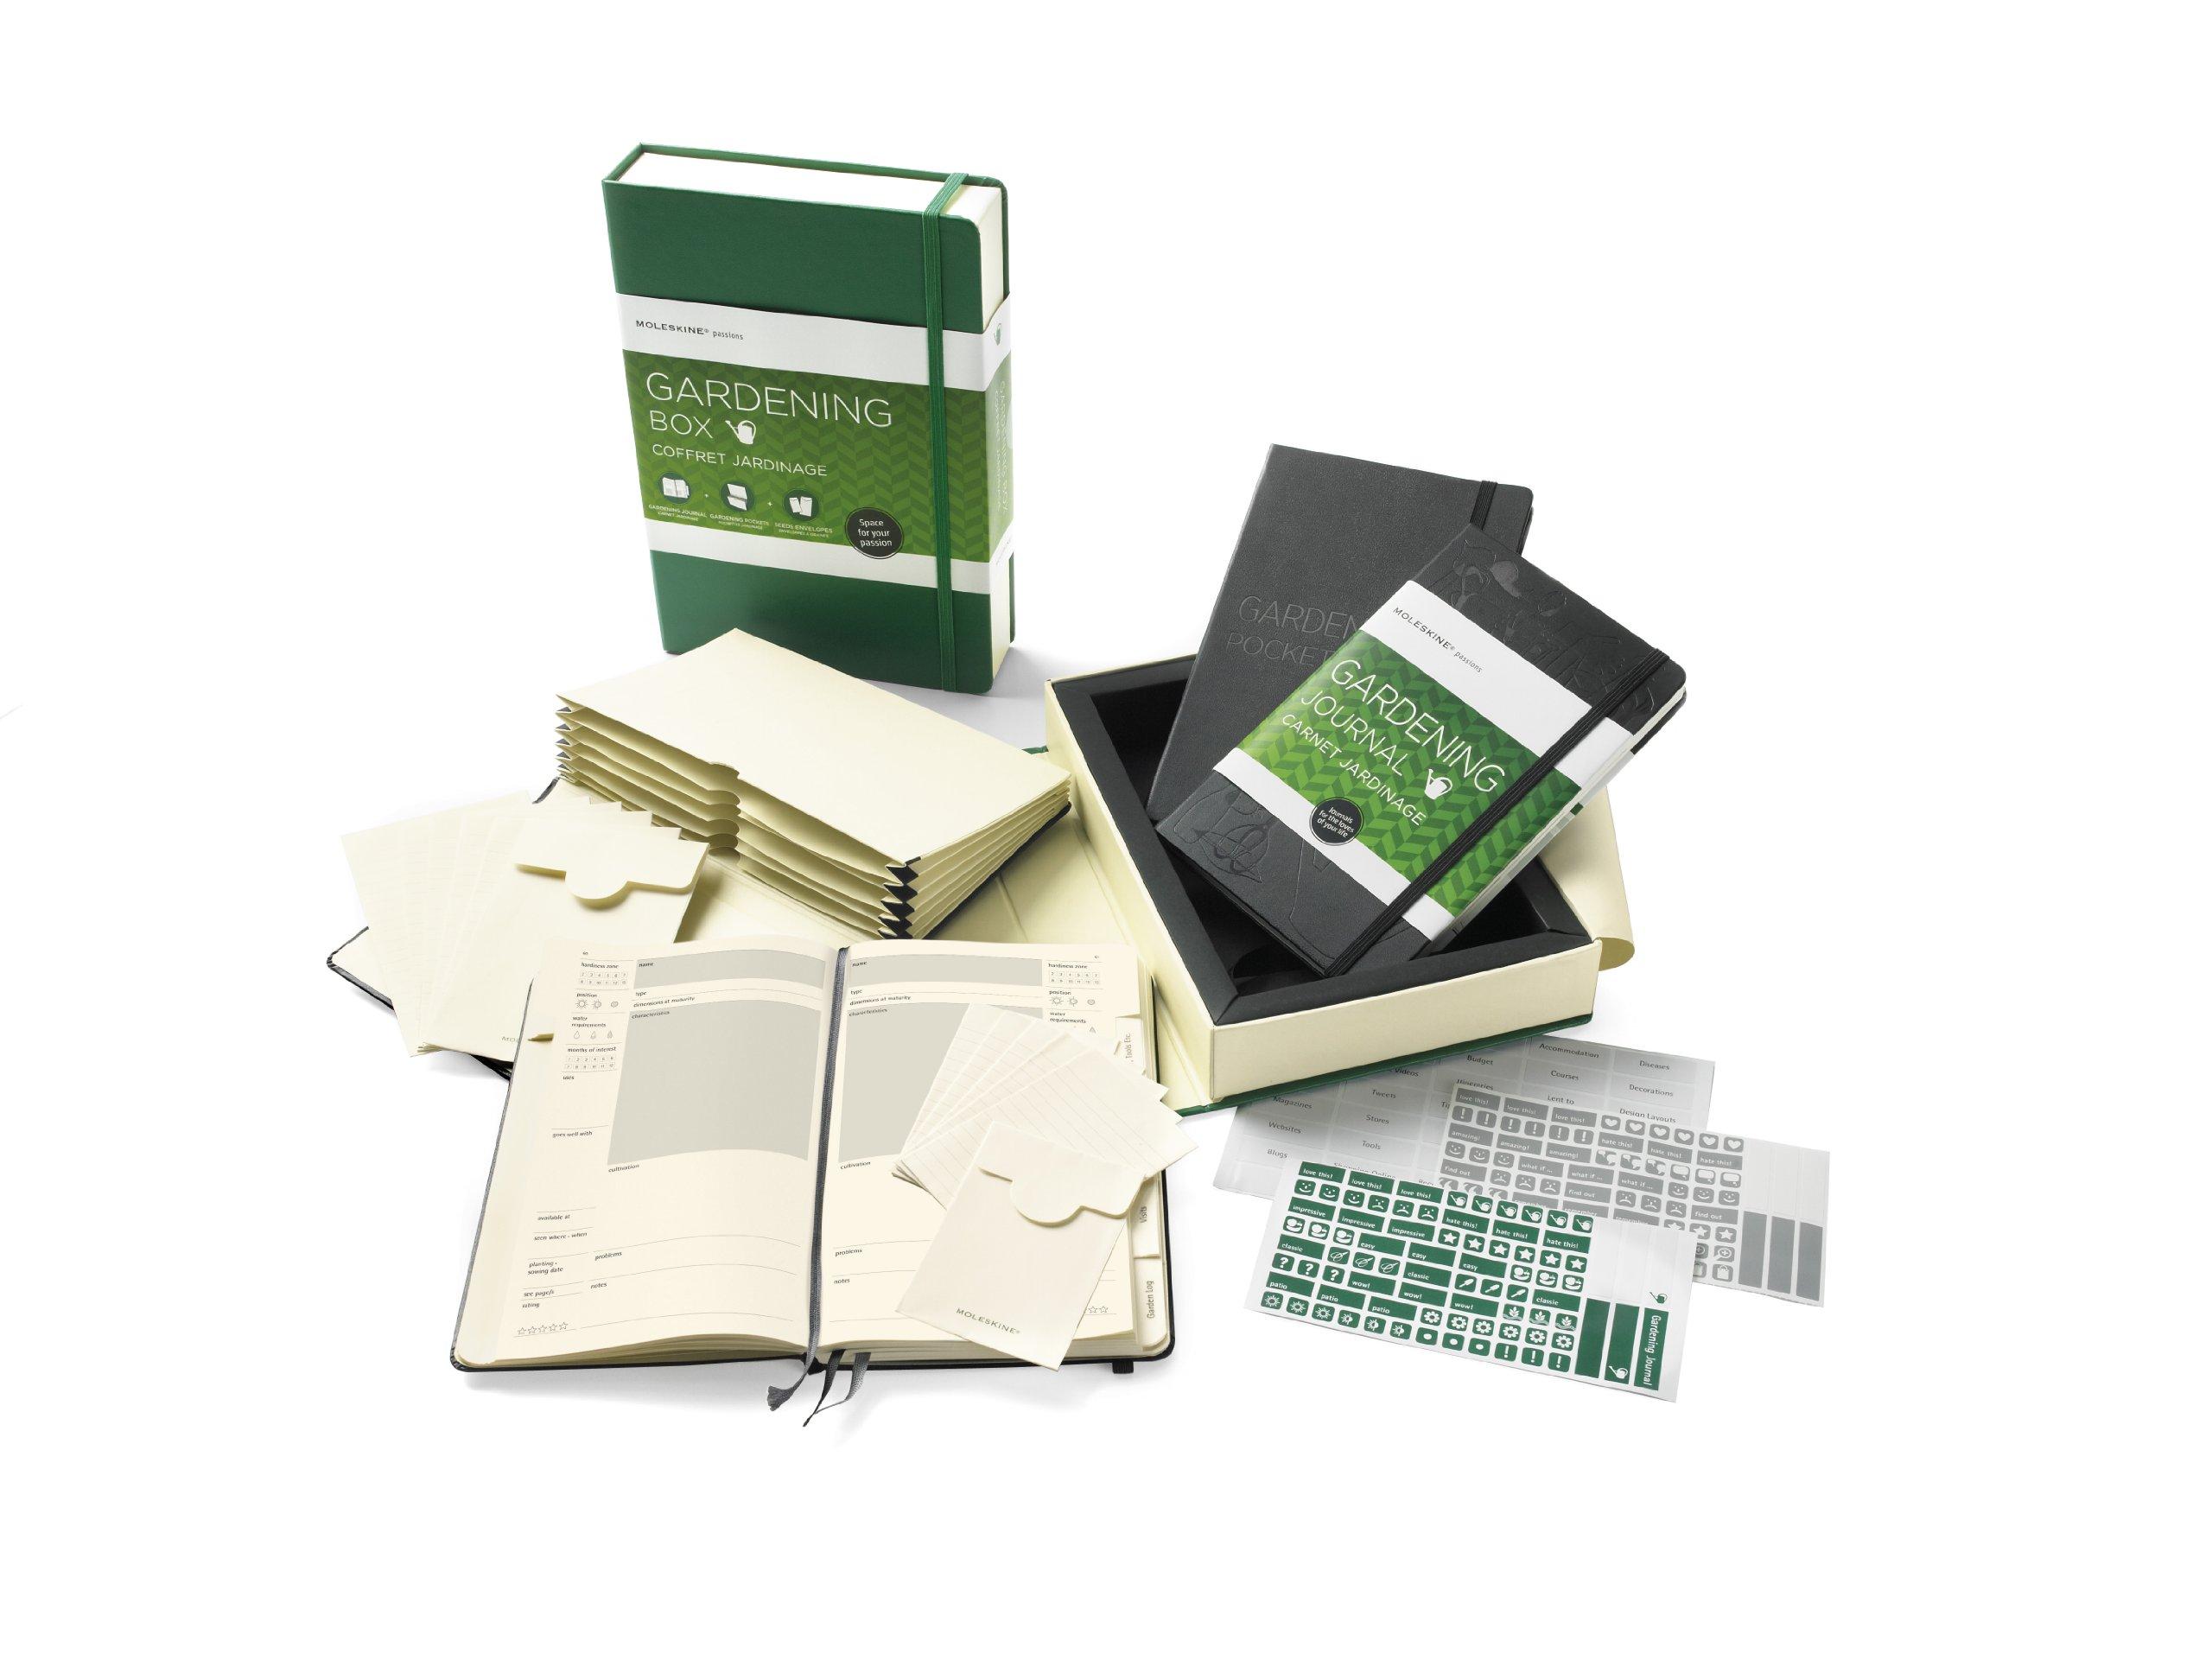 Amazon.com: Moleskine Gift Box   Gardening (7 X 10.25) (Gift Box Sets)  (9788866130161): Moleskine: Books